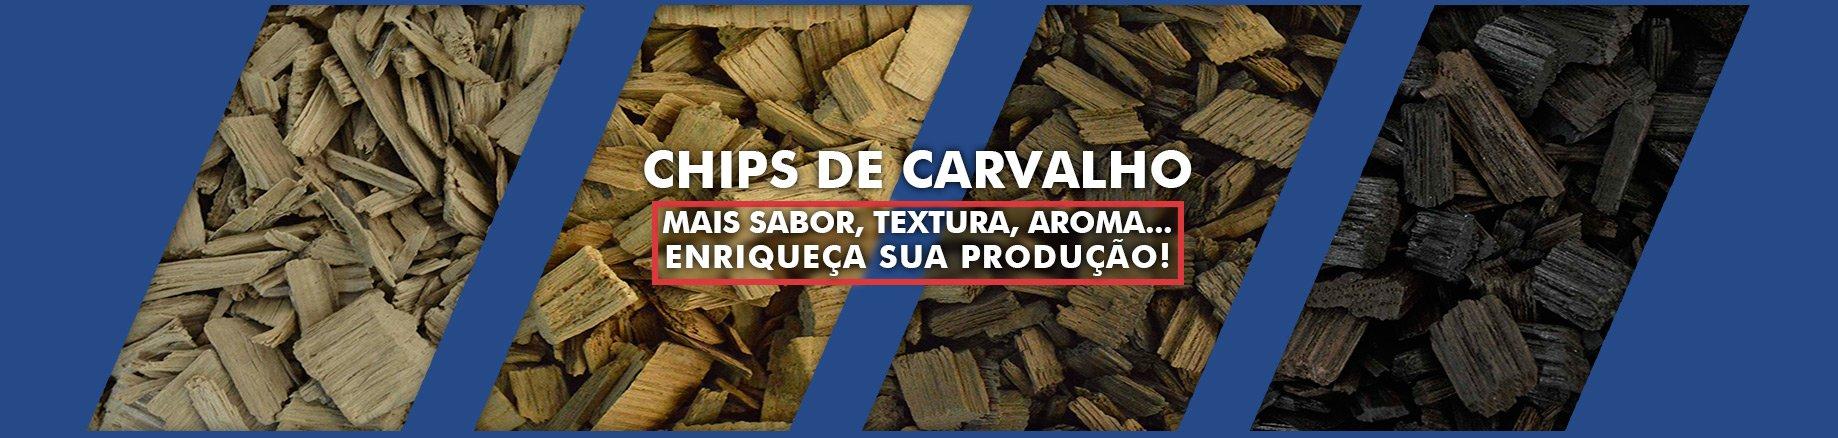 Chips de Carvalho